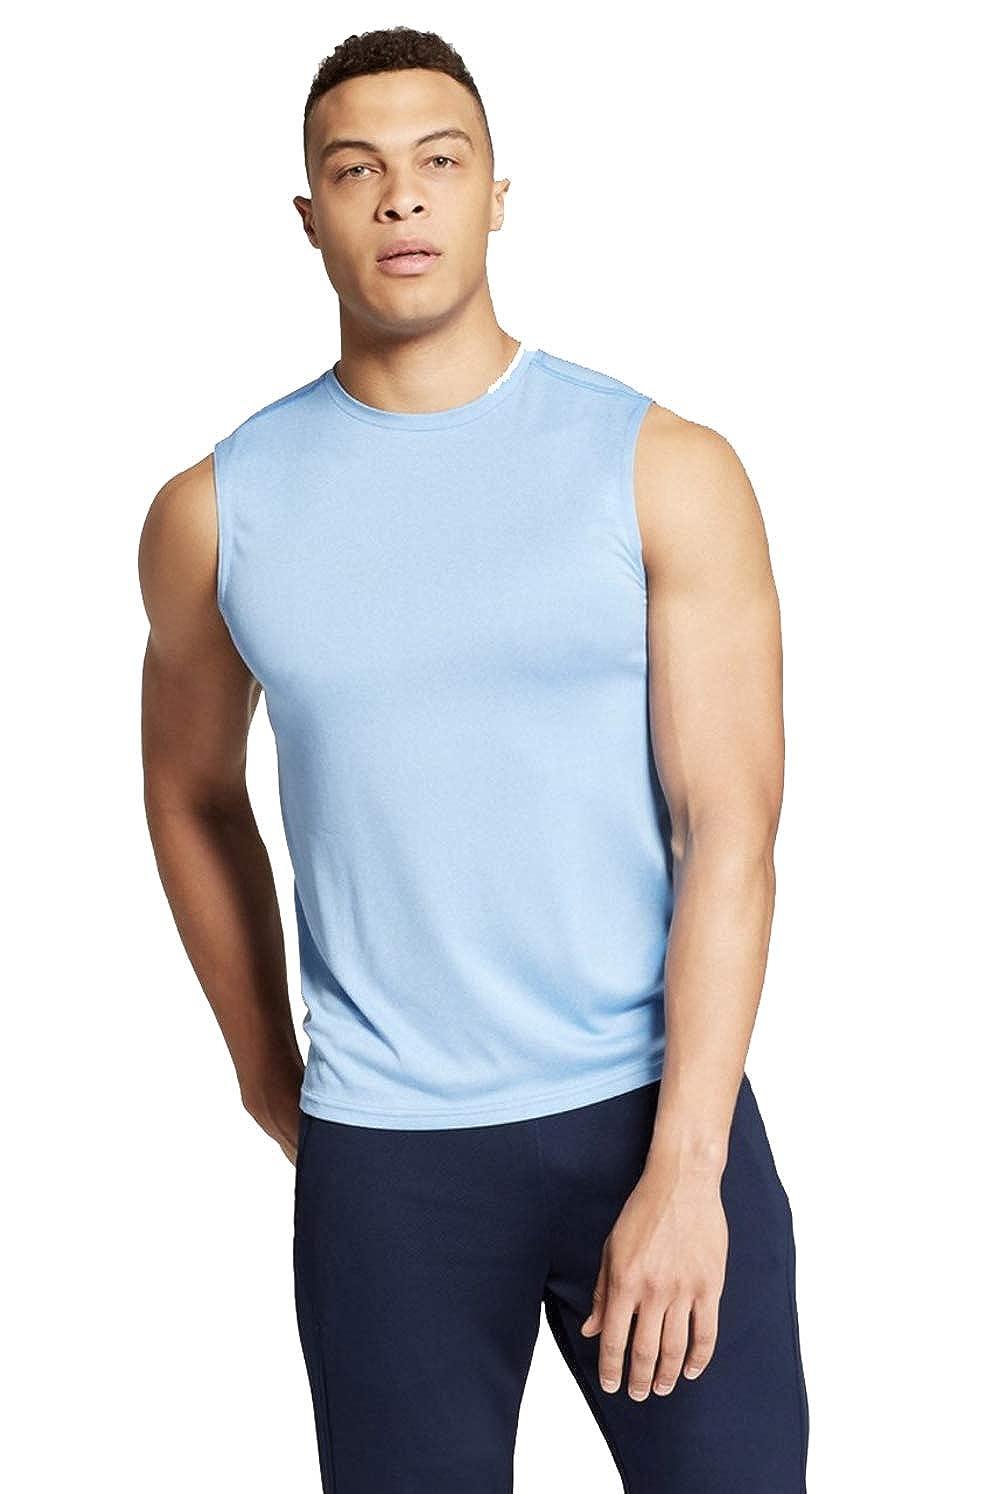 93996237 Champion C9 Men's Sleeveless Tech T-Shirt - at Amazon Men's Clothing store: